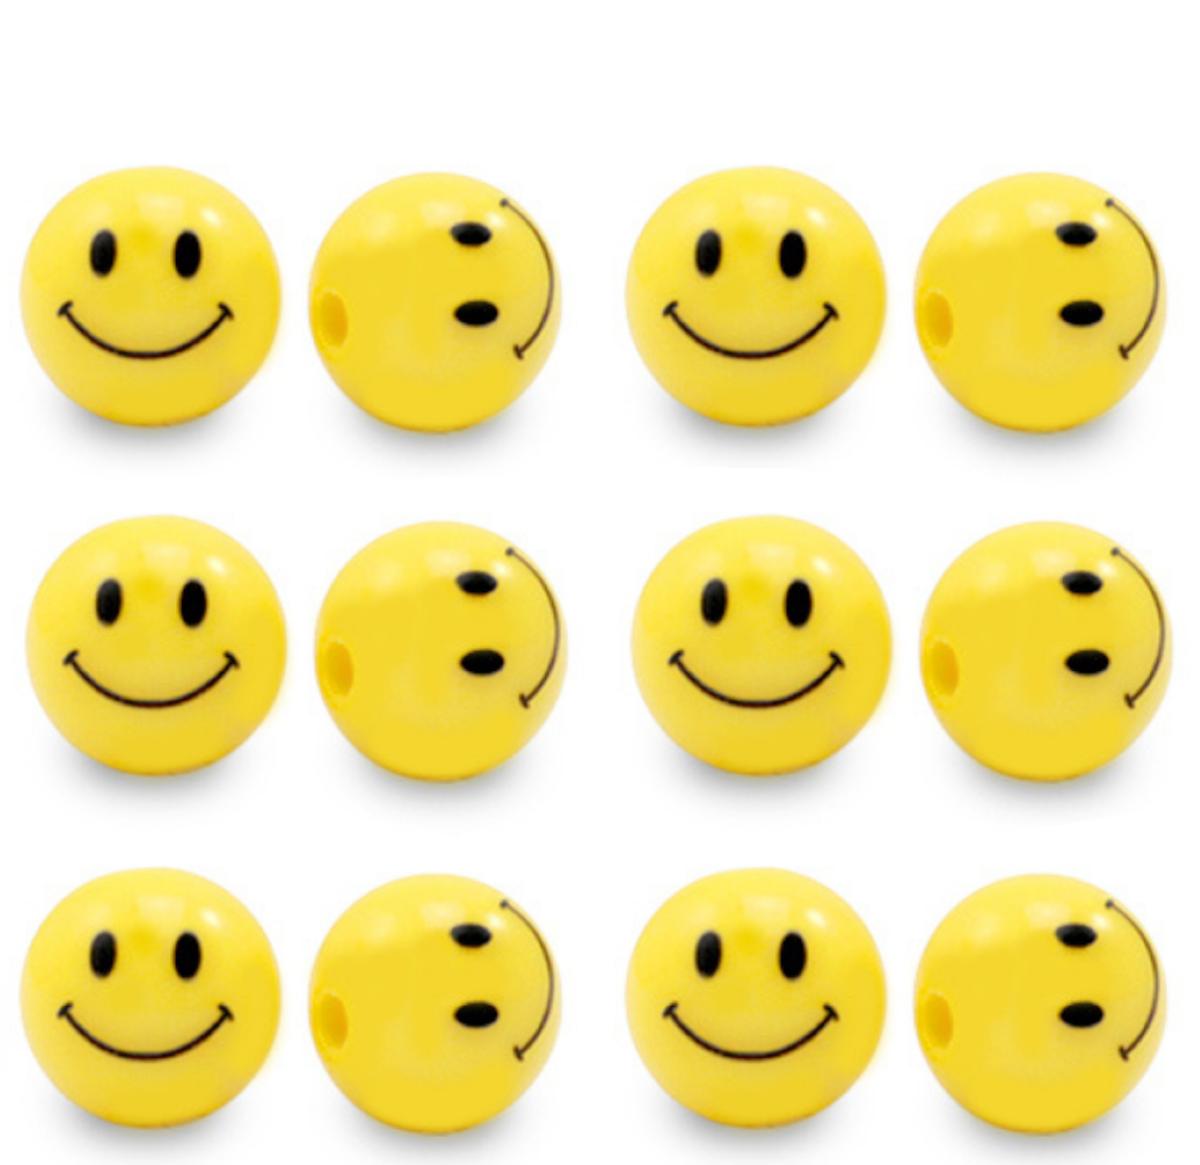 Acrylperlen Smiley 10mm 35 Stück, Farbe wählbar